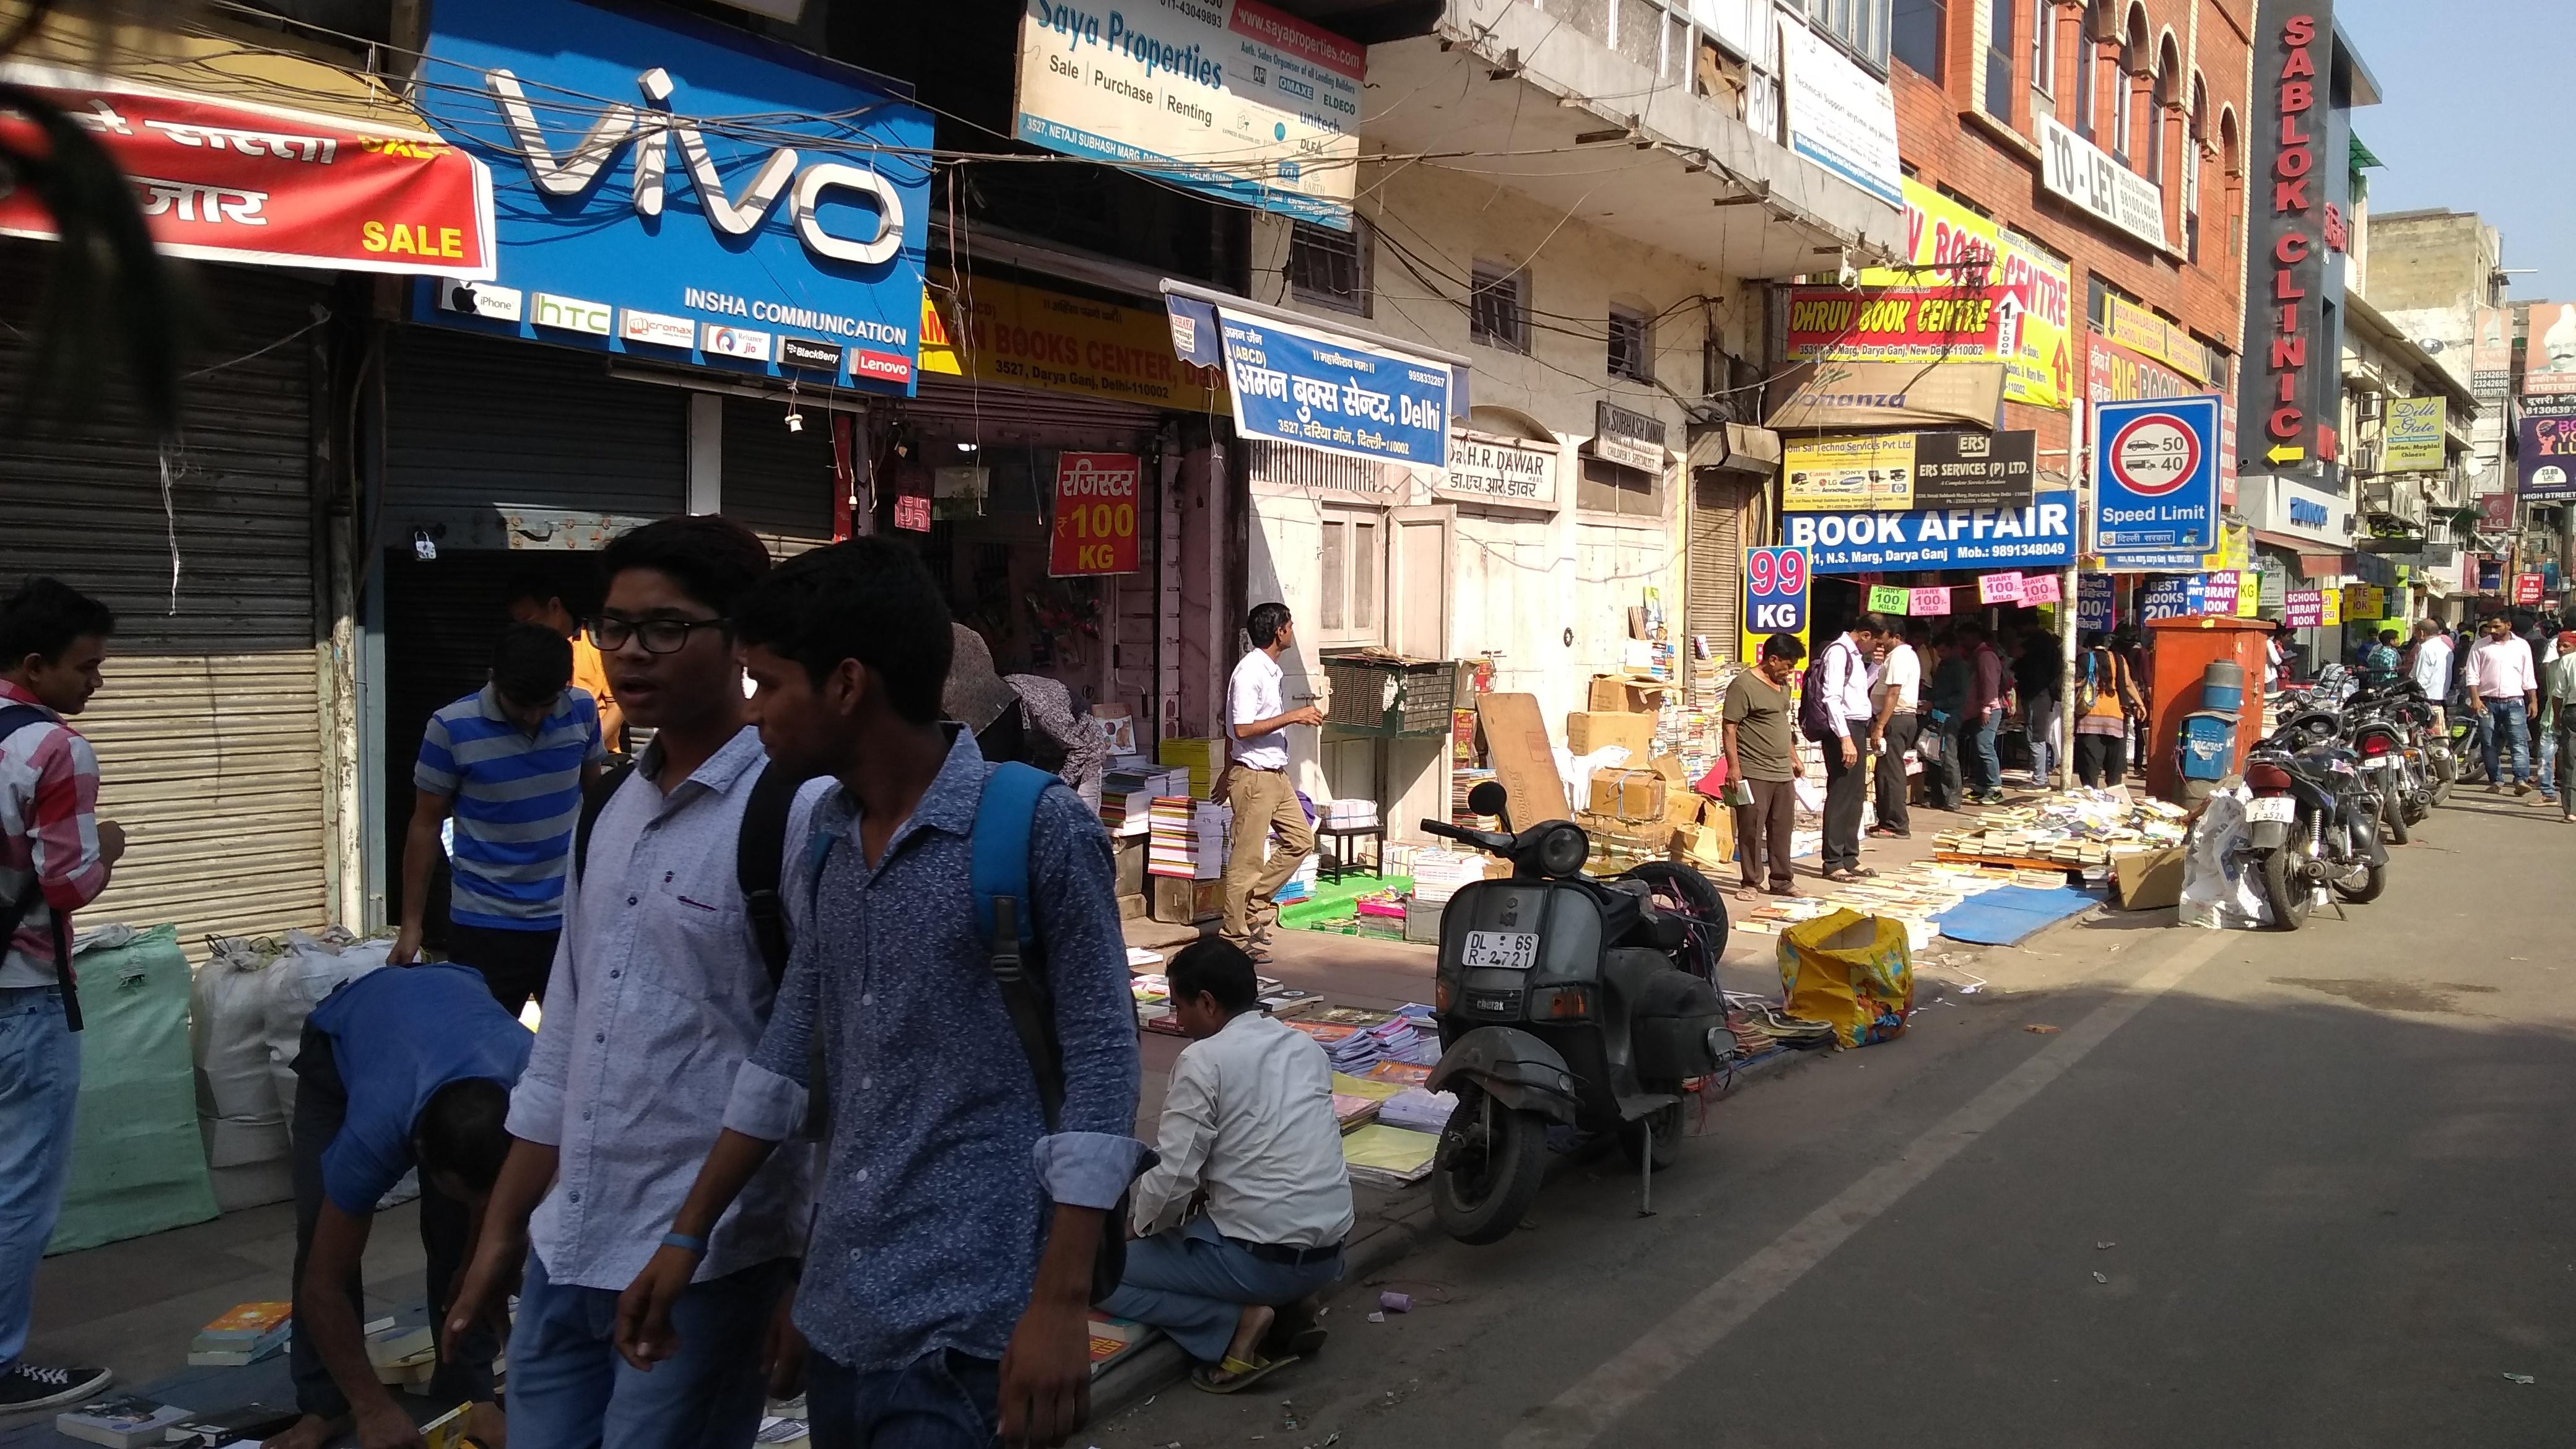 File:Sunday morning roadside second-hand book market at Daryaganj, Delhi  -1.jpg - Wikimedia Commons